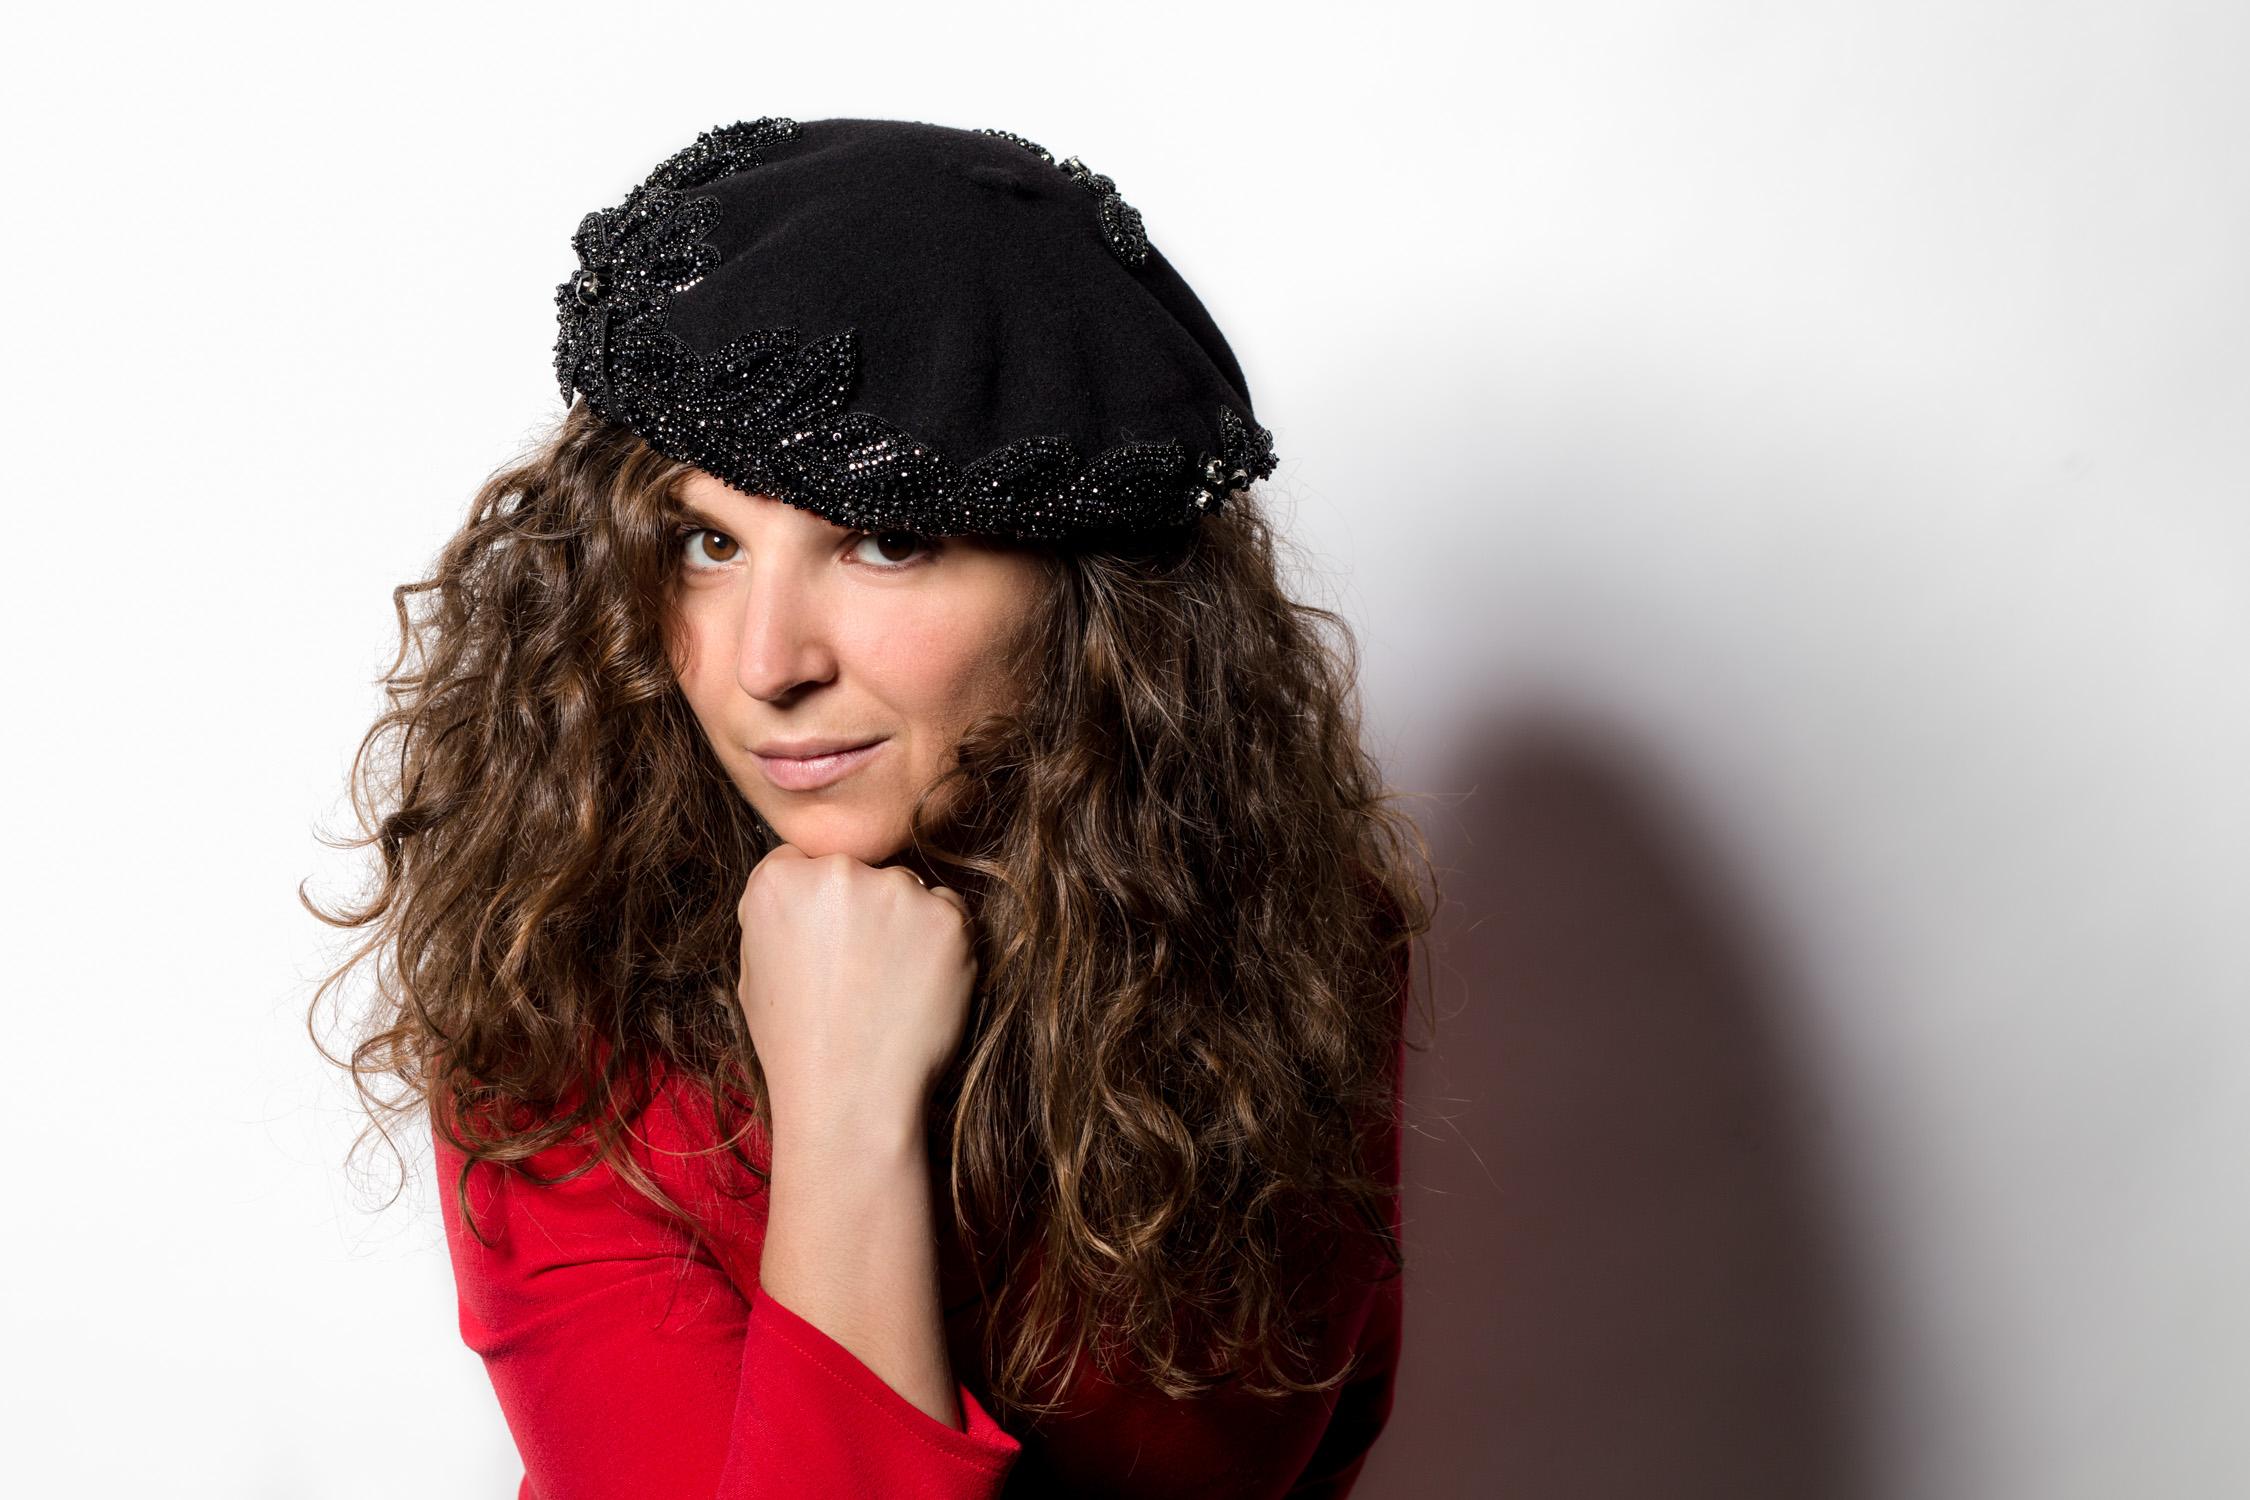 laulhere beret